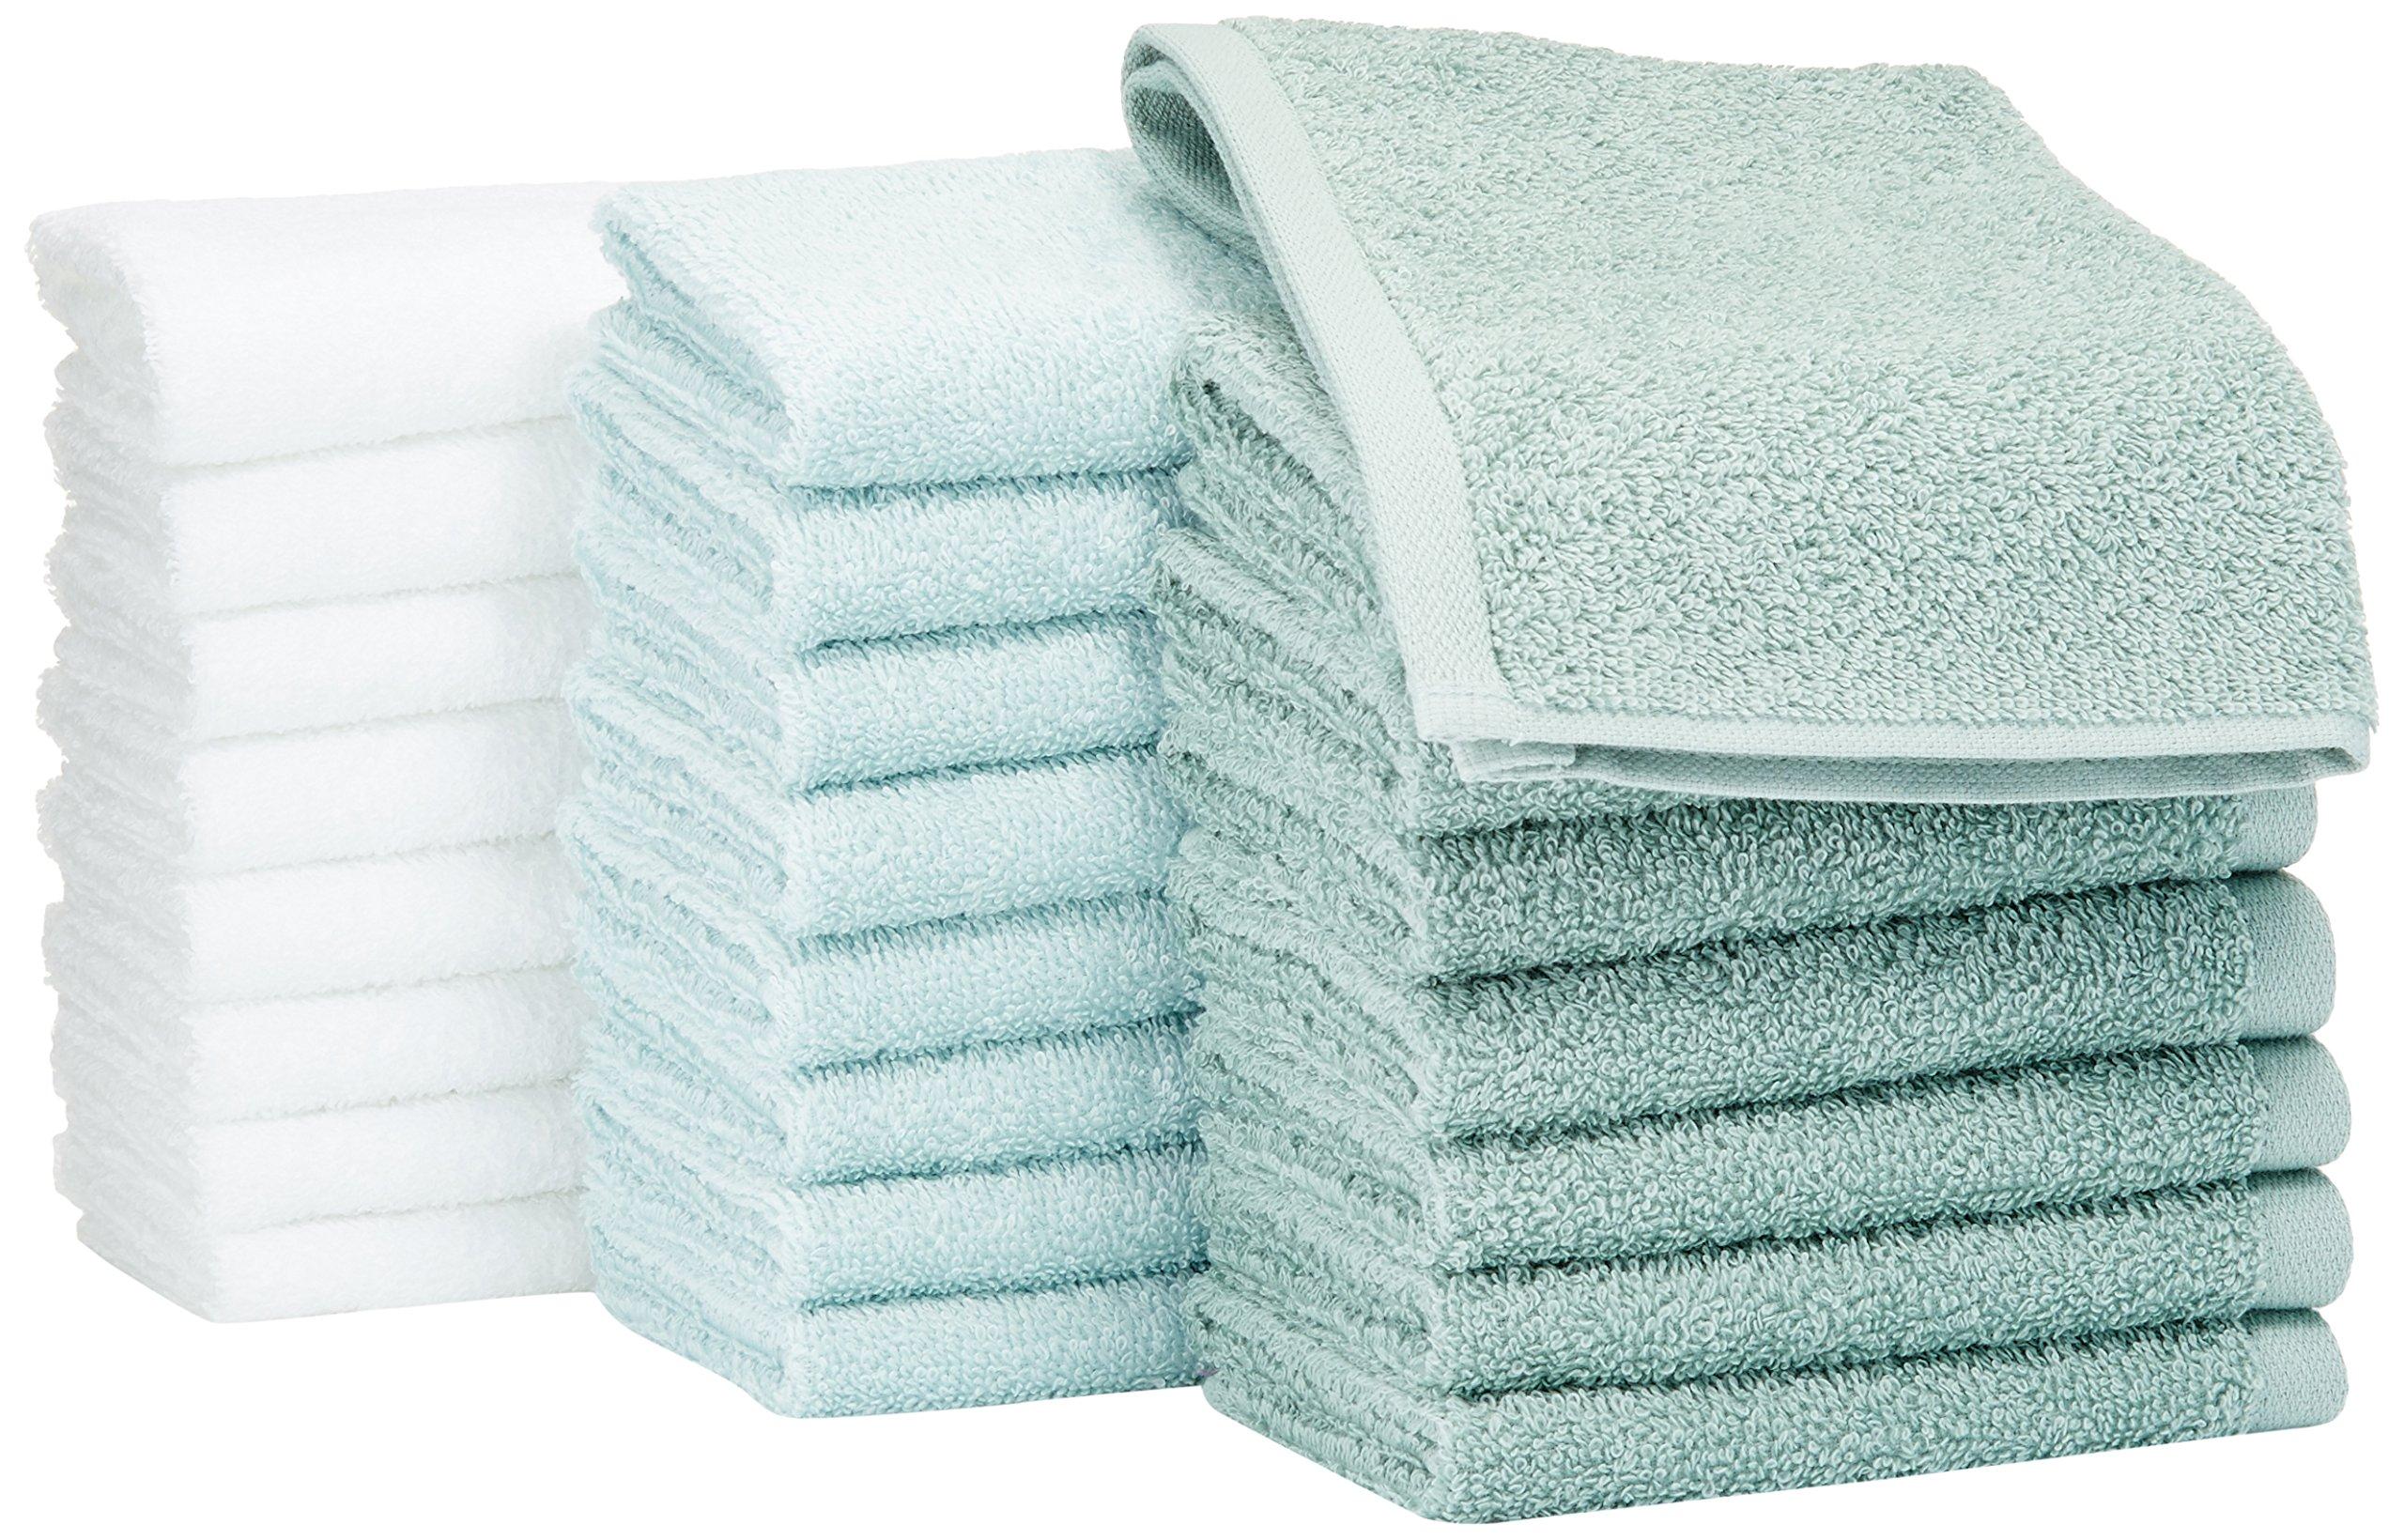 AmazonBasics Washcloth - Pack of 24 (Multi-color: Seafoam Green, Ice Blue, White)